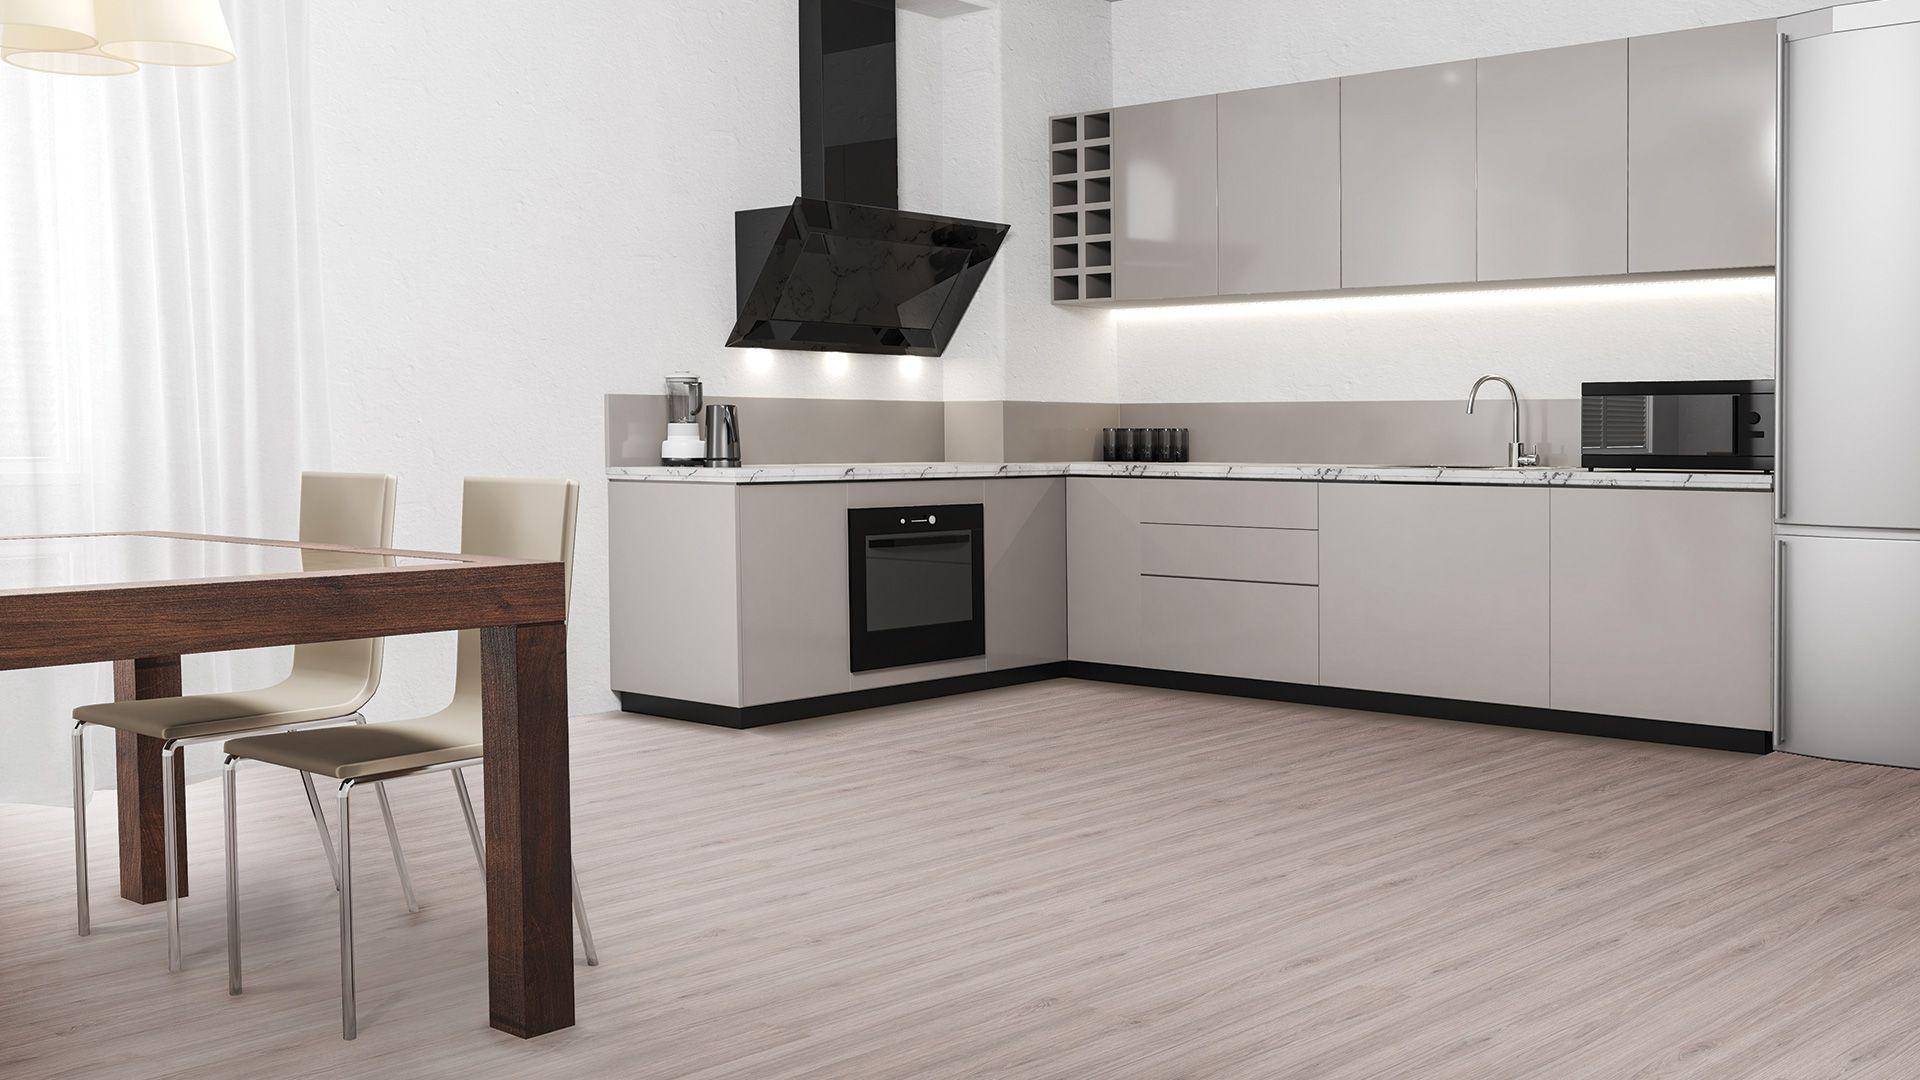 Latte Oak 8Mm Ac3 Laminate Flooring 1205Mmx197Mm 2555 Sqftbox